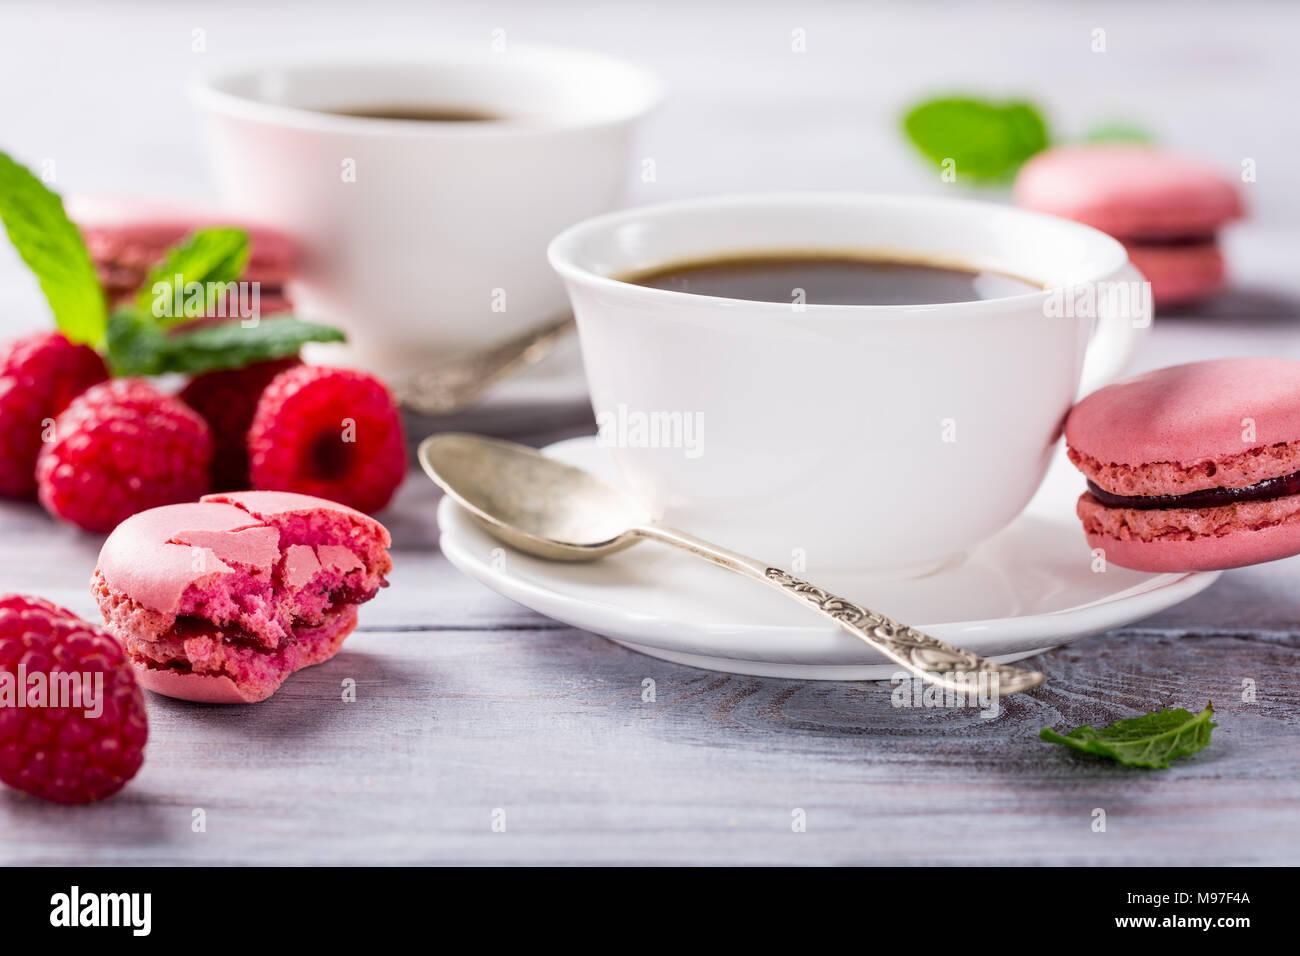 Taza de café con galletas de frambuesa francés Imagen De Stock